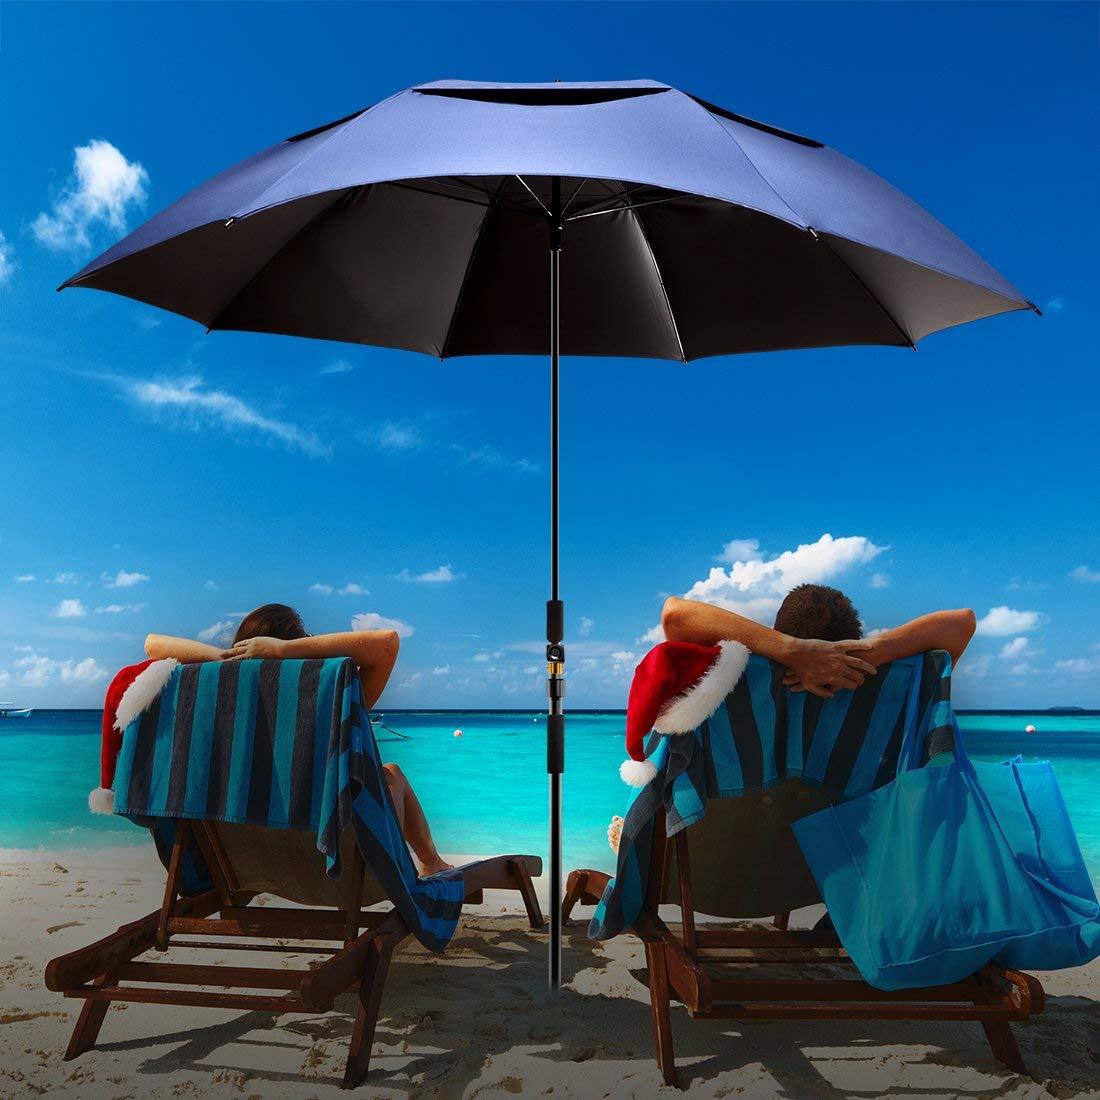 Best Beach Umbrella Reviews – TOP 8 of 2021